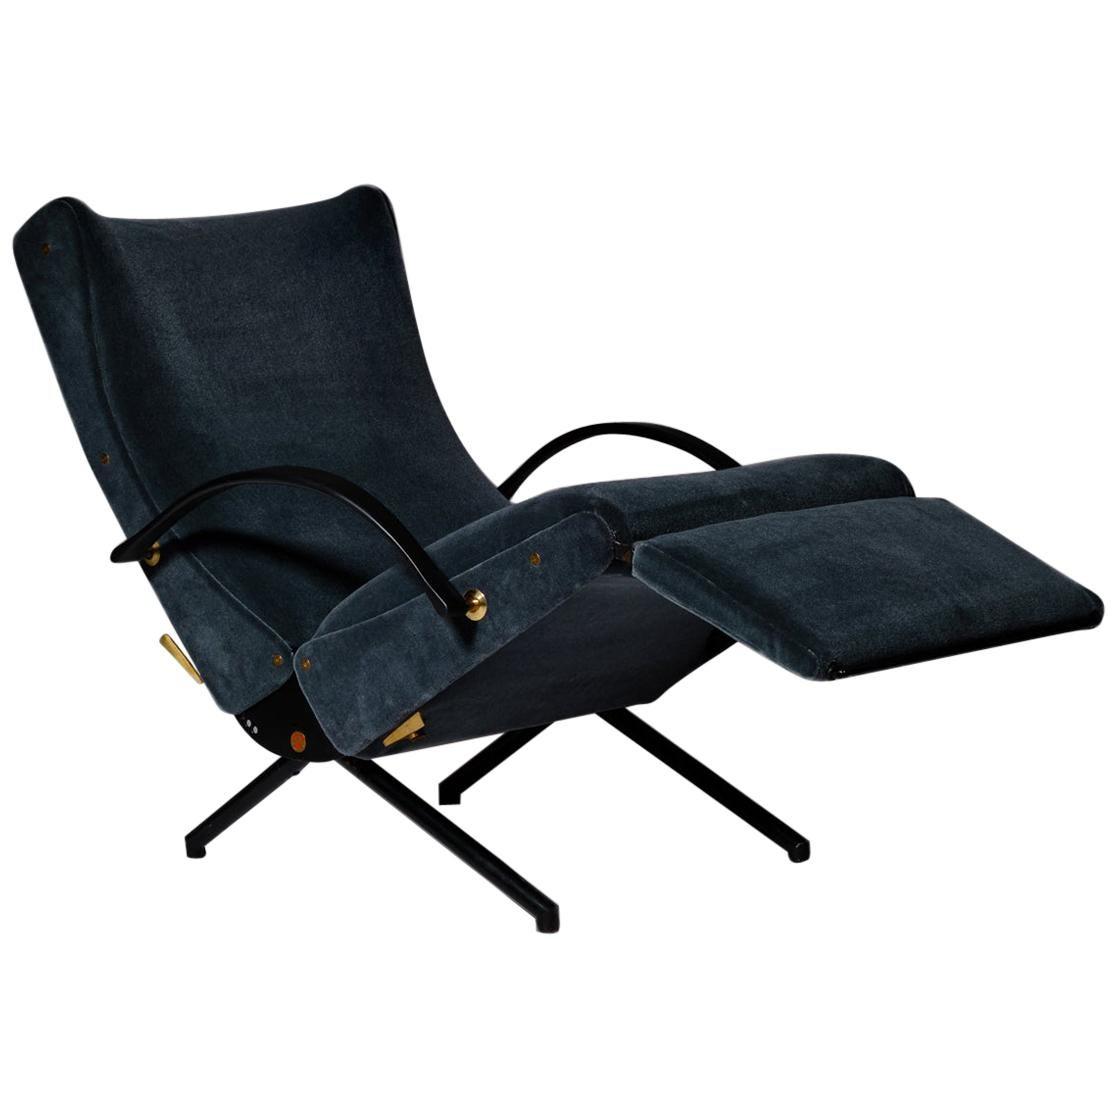 Osvaldo Borsani P40 Lounge Chair for Tecno, Italy, 1955